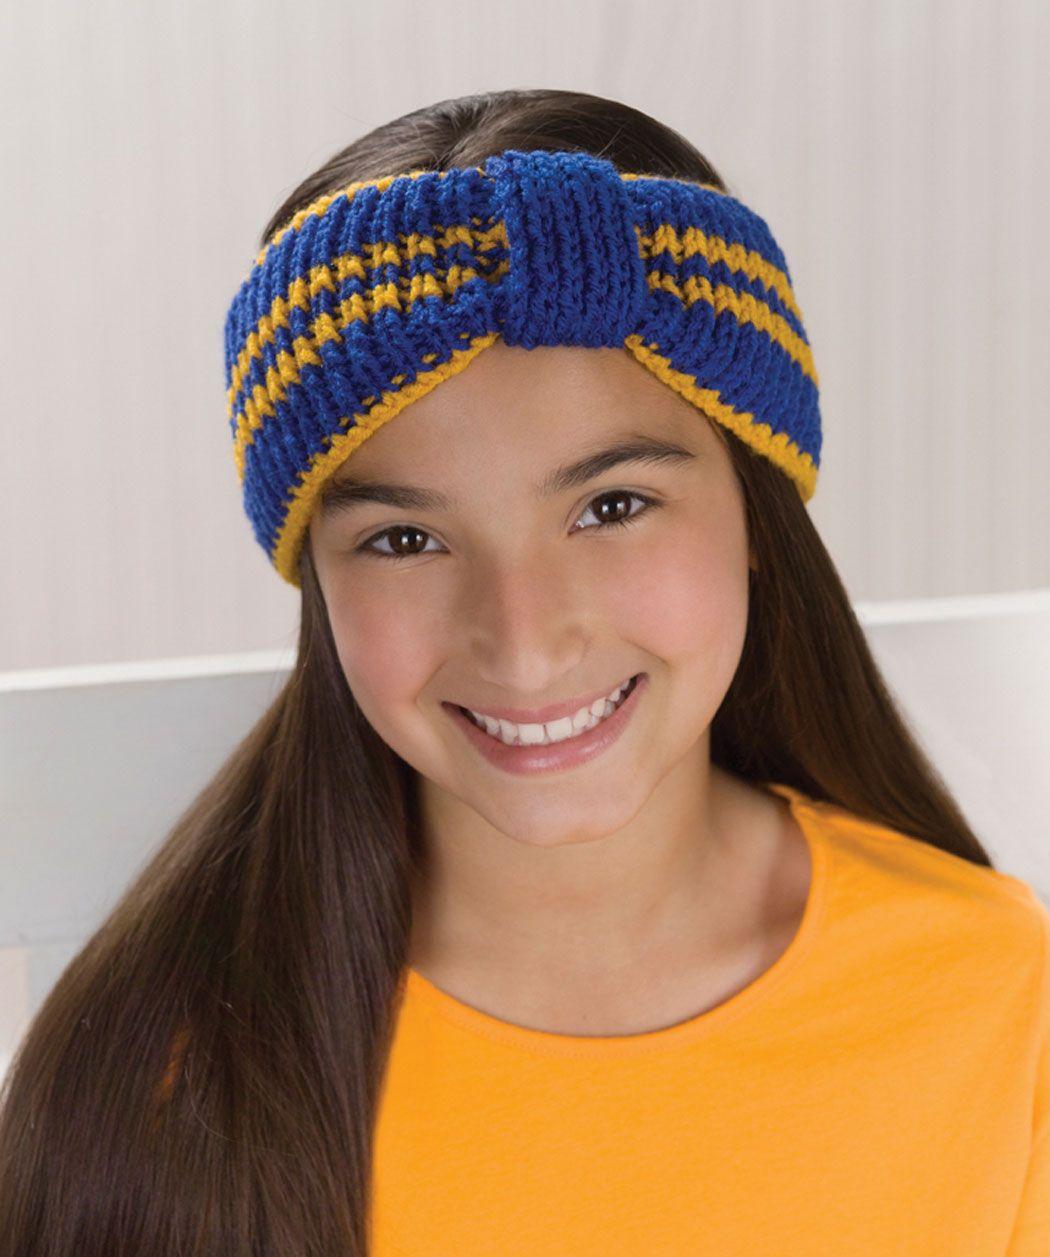 Sporty headband knit home hats scarfs mitts pinterest easy knitting sporty headband bankloansurffo Images